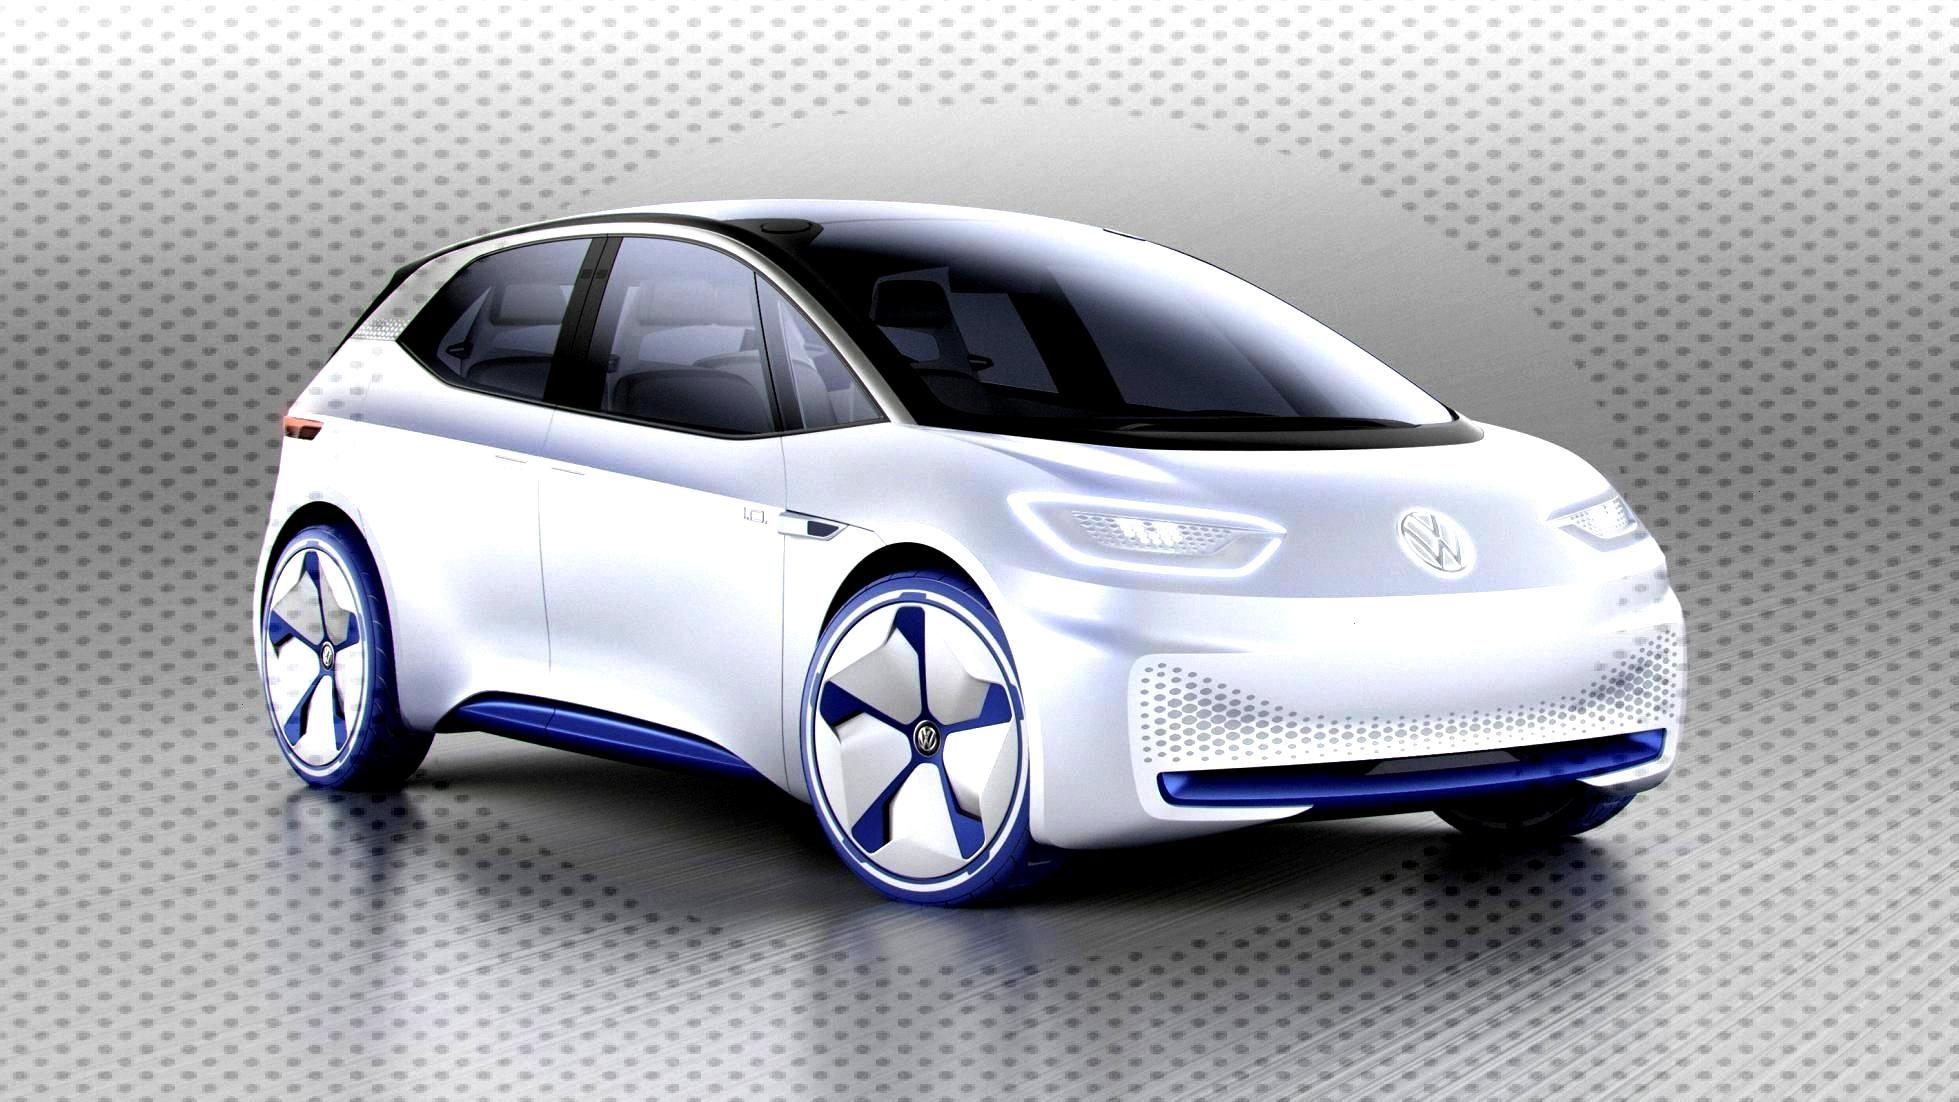 Elektrische Elektroauto Volkswagen Autos Dies Fur 2020 Ist Das Von Dies Ist Das Elektroauto Von Vol In 2020 Vw Electric Car Electric Car Concept Electric Car